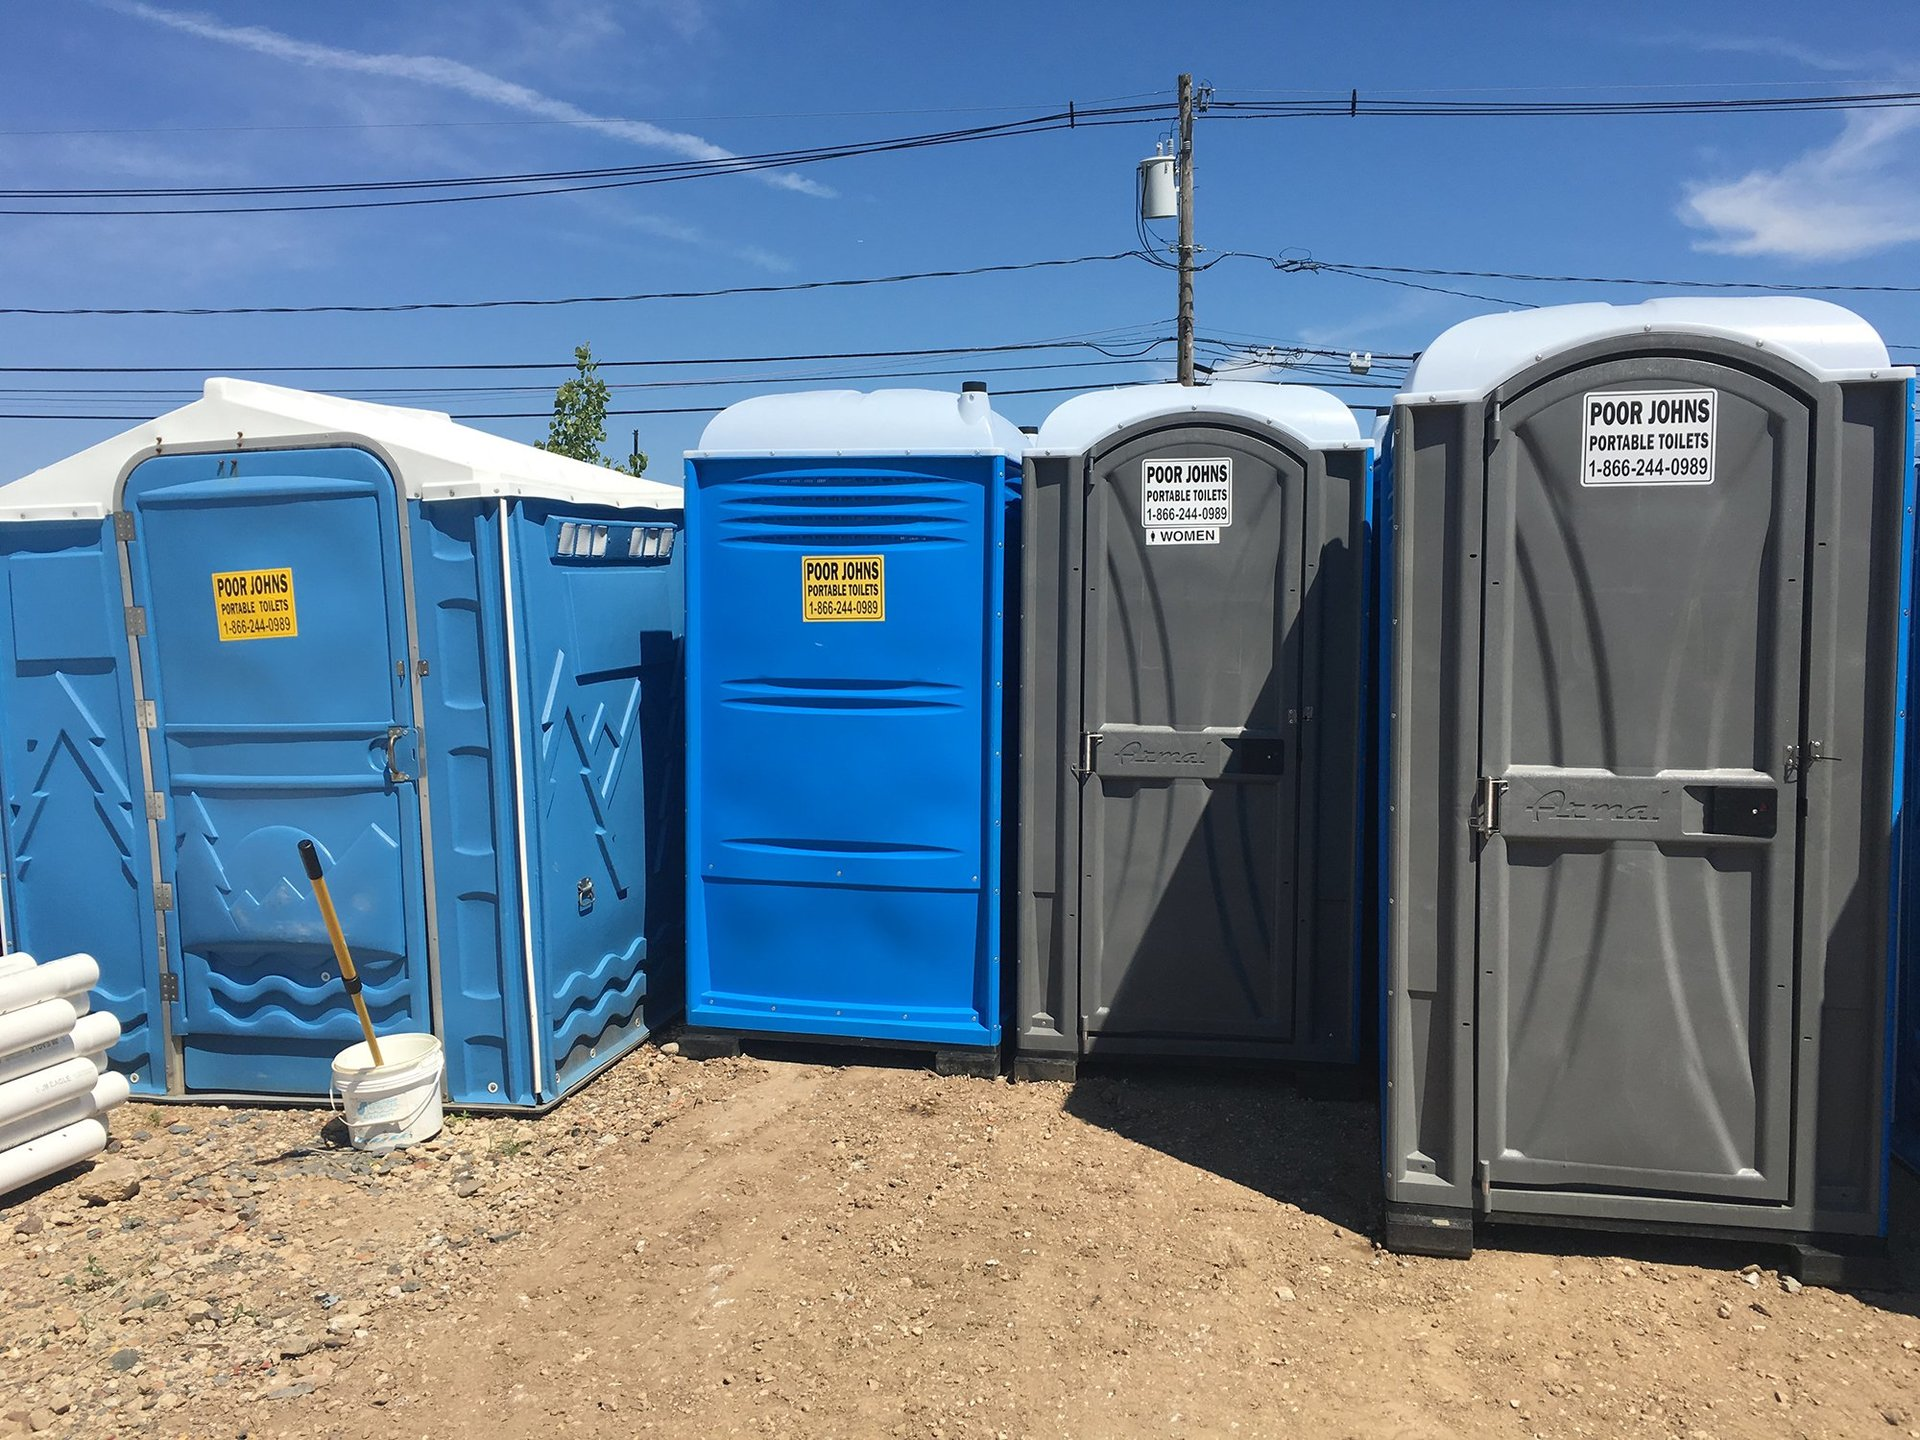 Poor John's Portable Toilets image 9